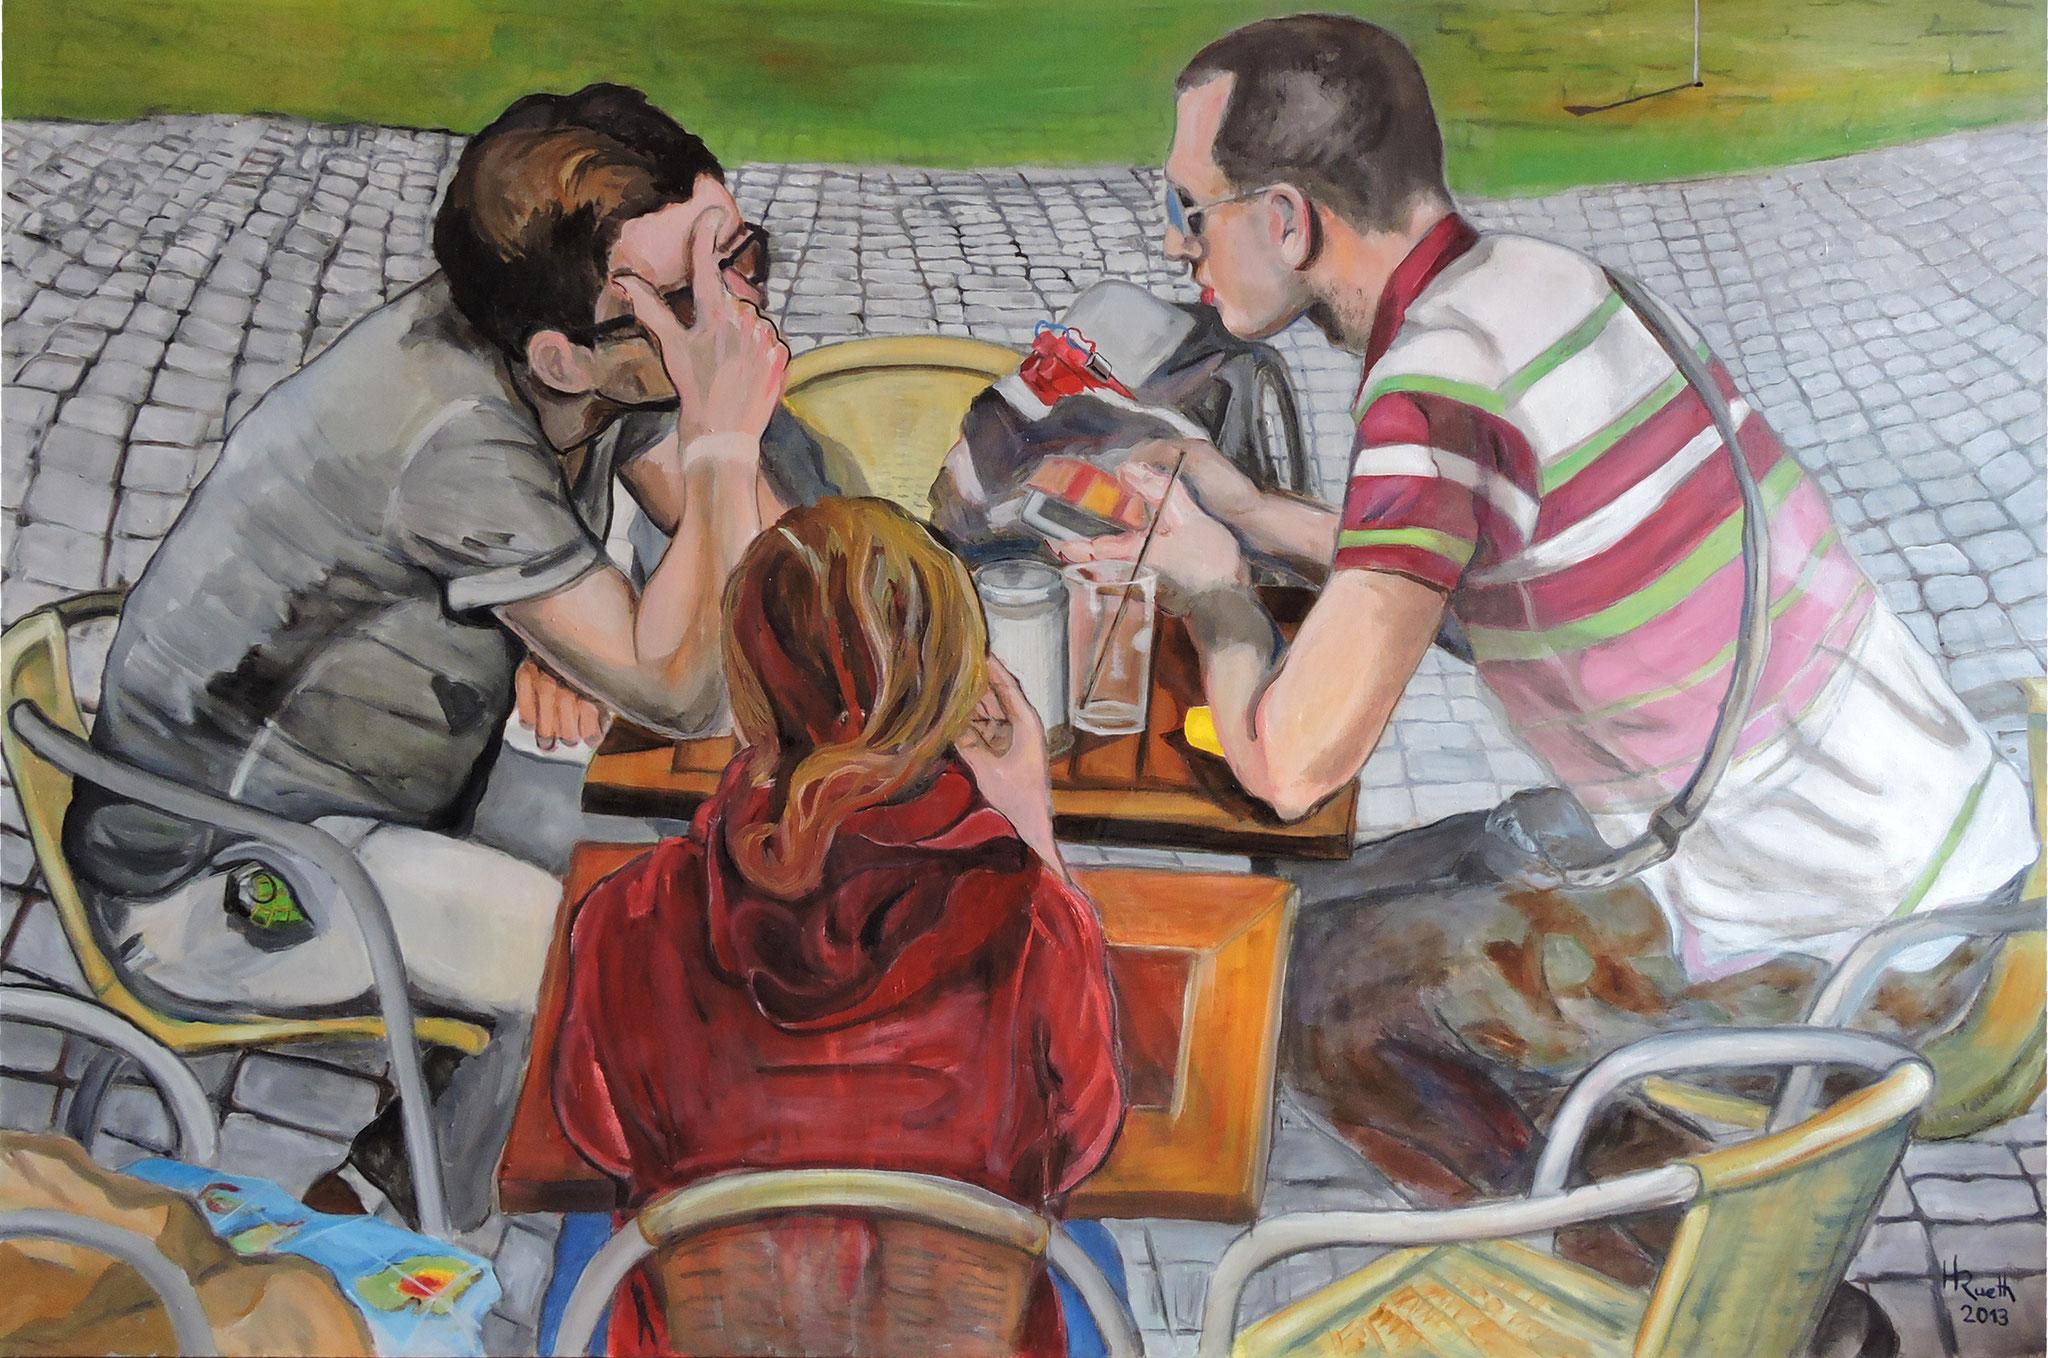 "Nr.14,"" Der Plan"", Öl auf Leinwand, 100 x 150 cm................................2400,- Euro"